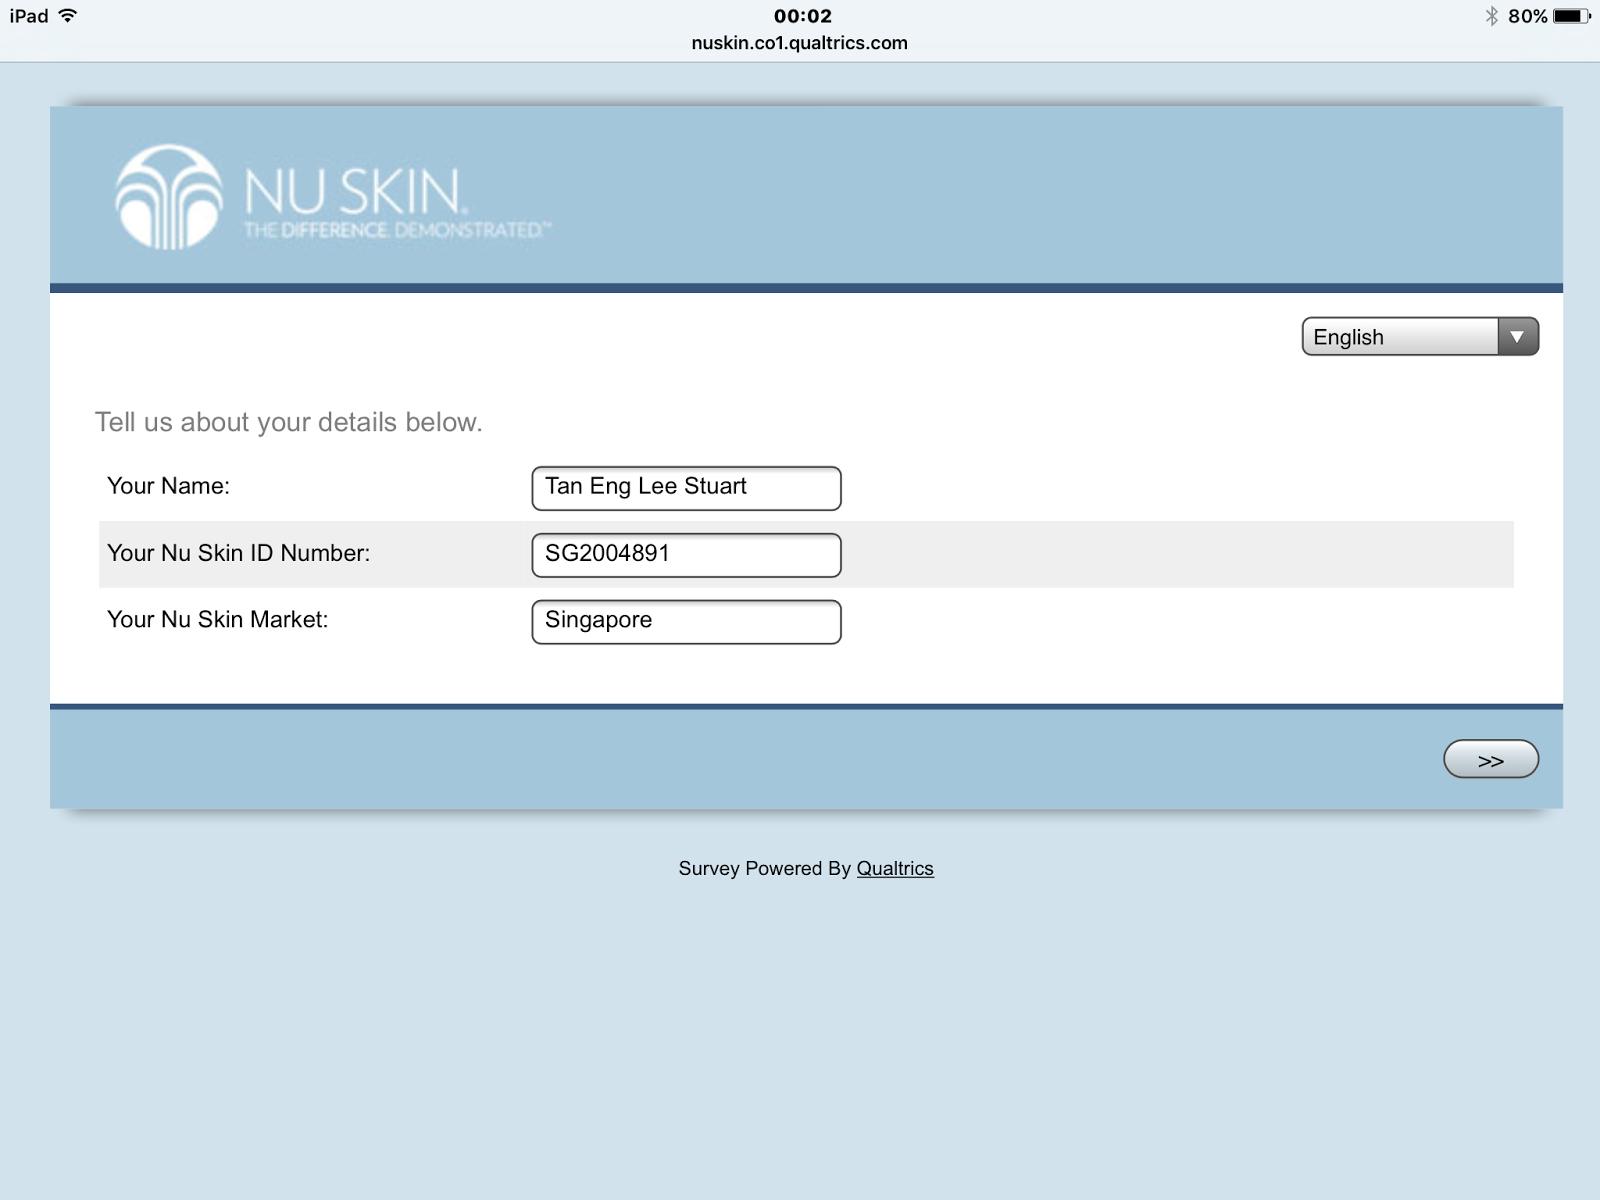 Nu Skin Sea Loi Certification Test Submitting Loi Certification Test